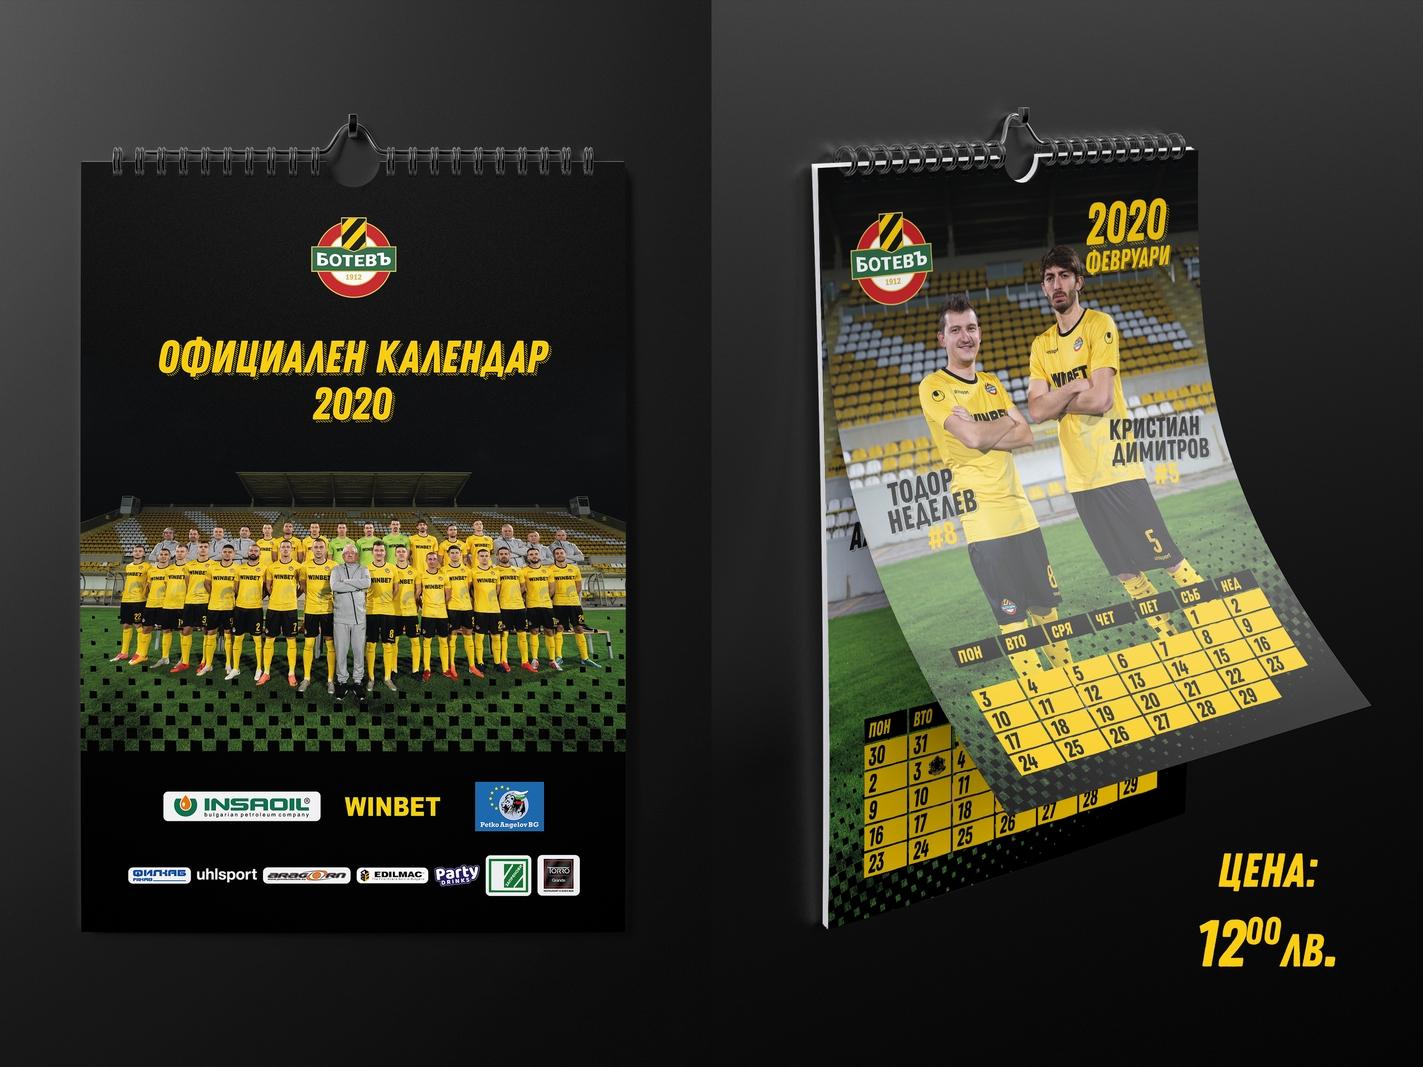 Многолистовият календар на Ботев (Пловдив) за 2020 година вече е